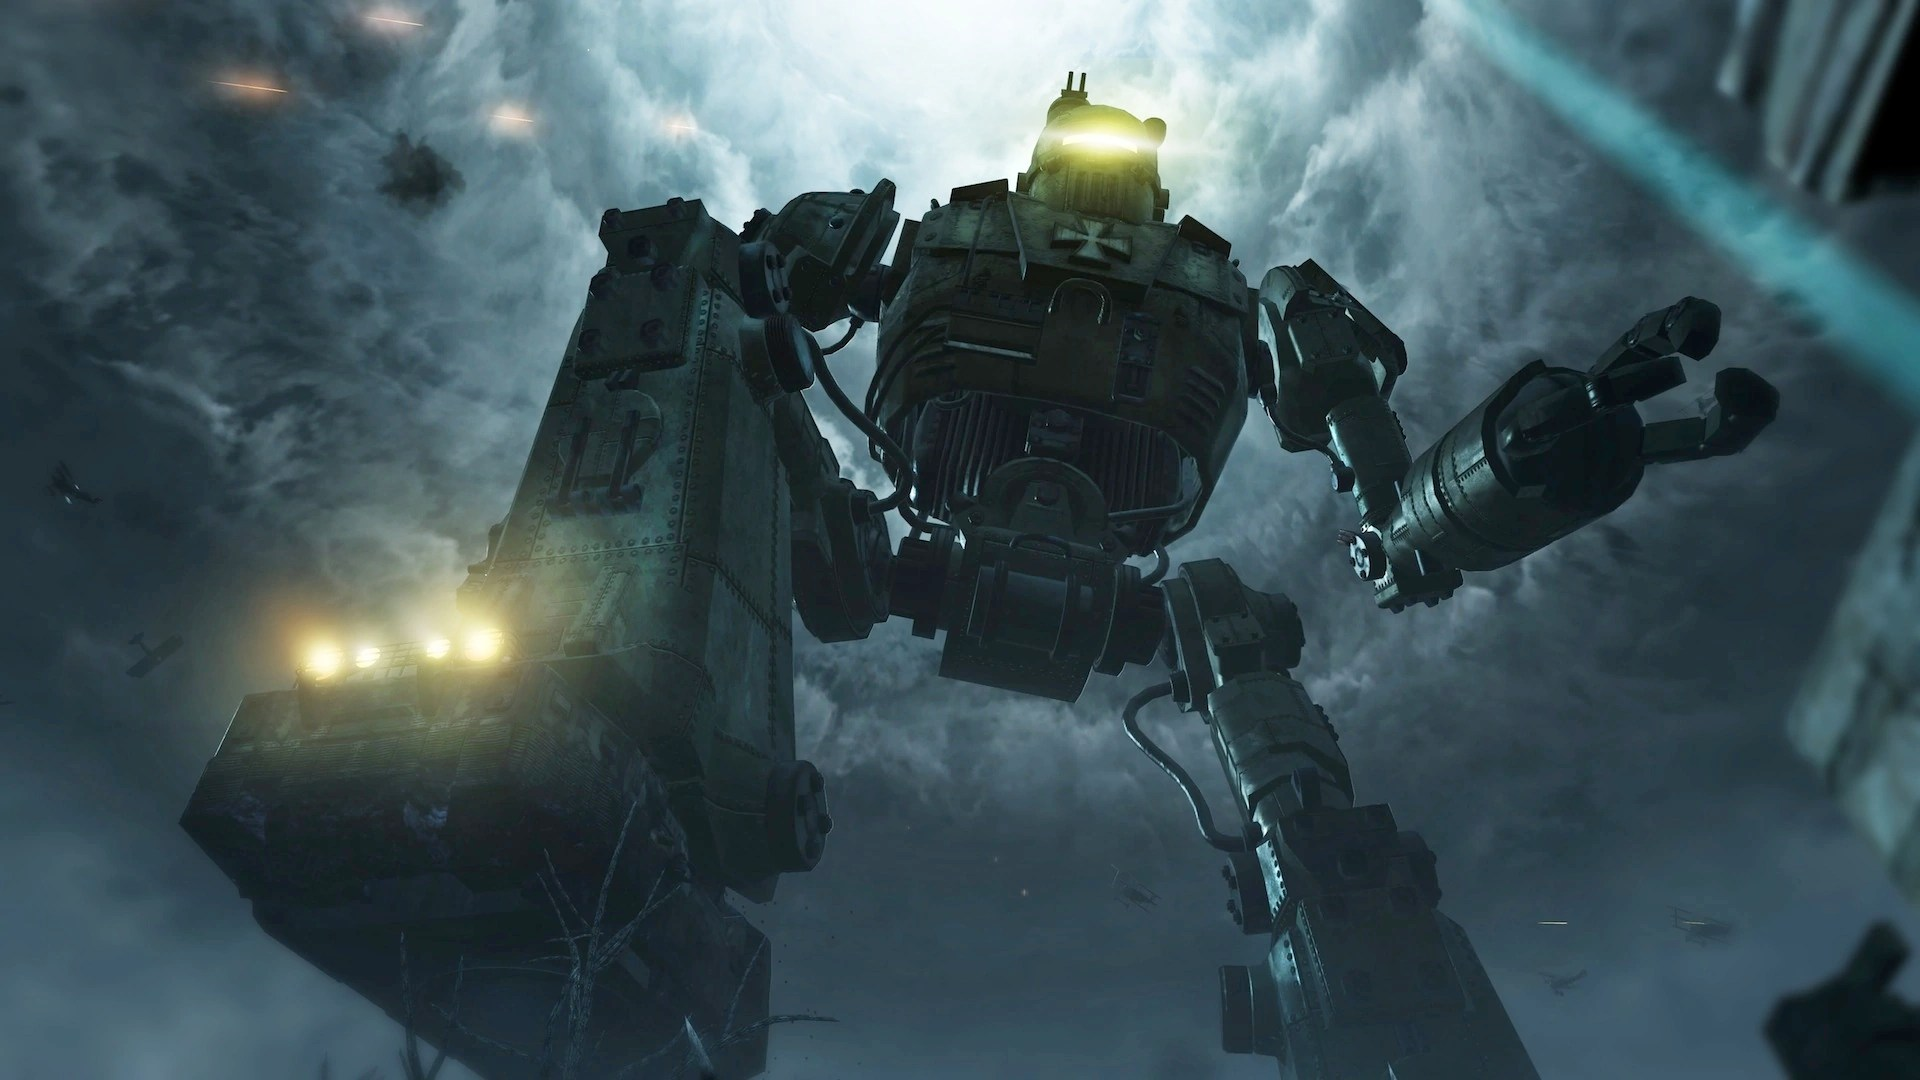 Call Of Duty Black Ops 2 Apocalypse Dlc Review Gamerscene Wordpress Com